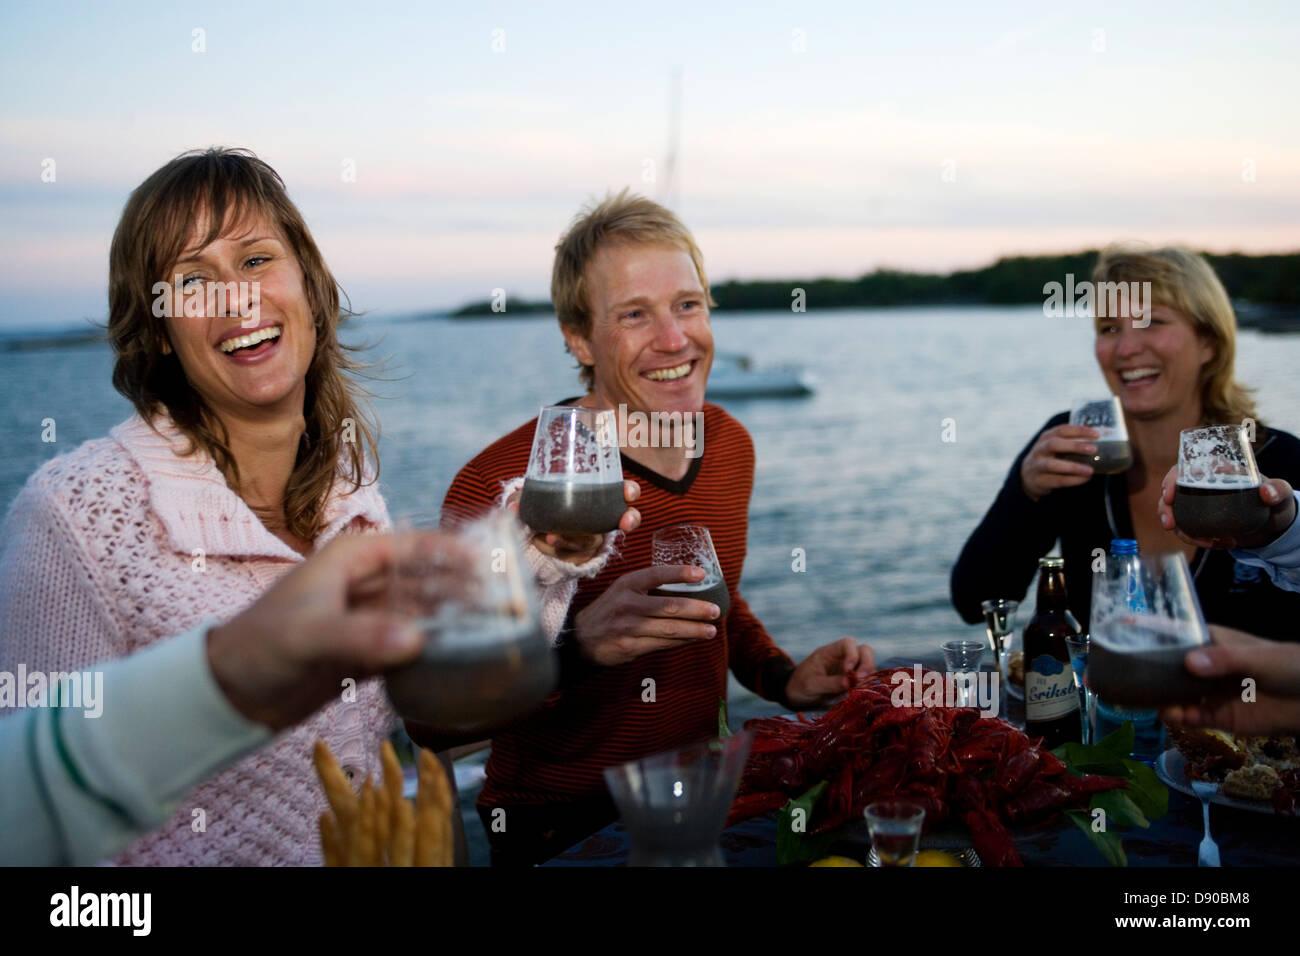 Crayfish party, Fejan, Stockholm archipelago. Stock Photo